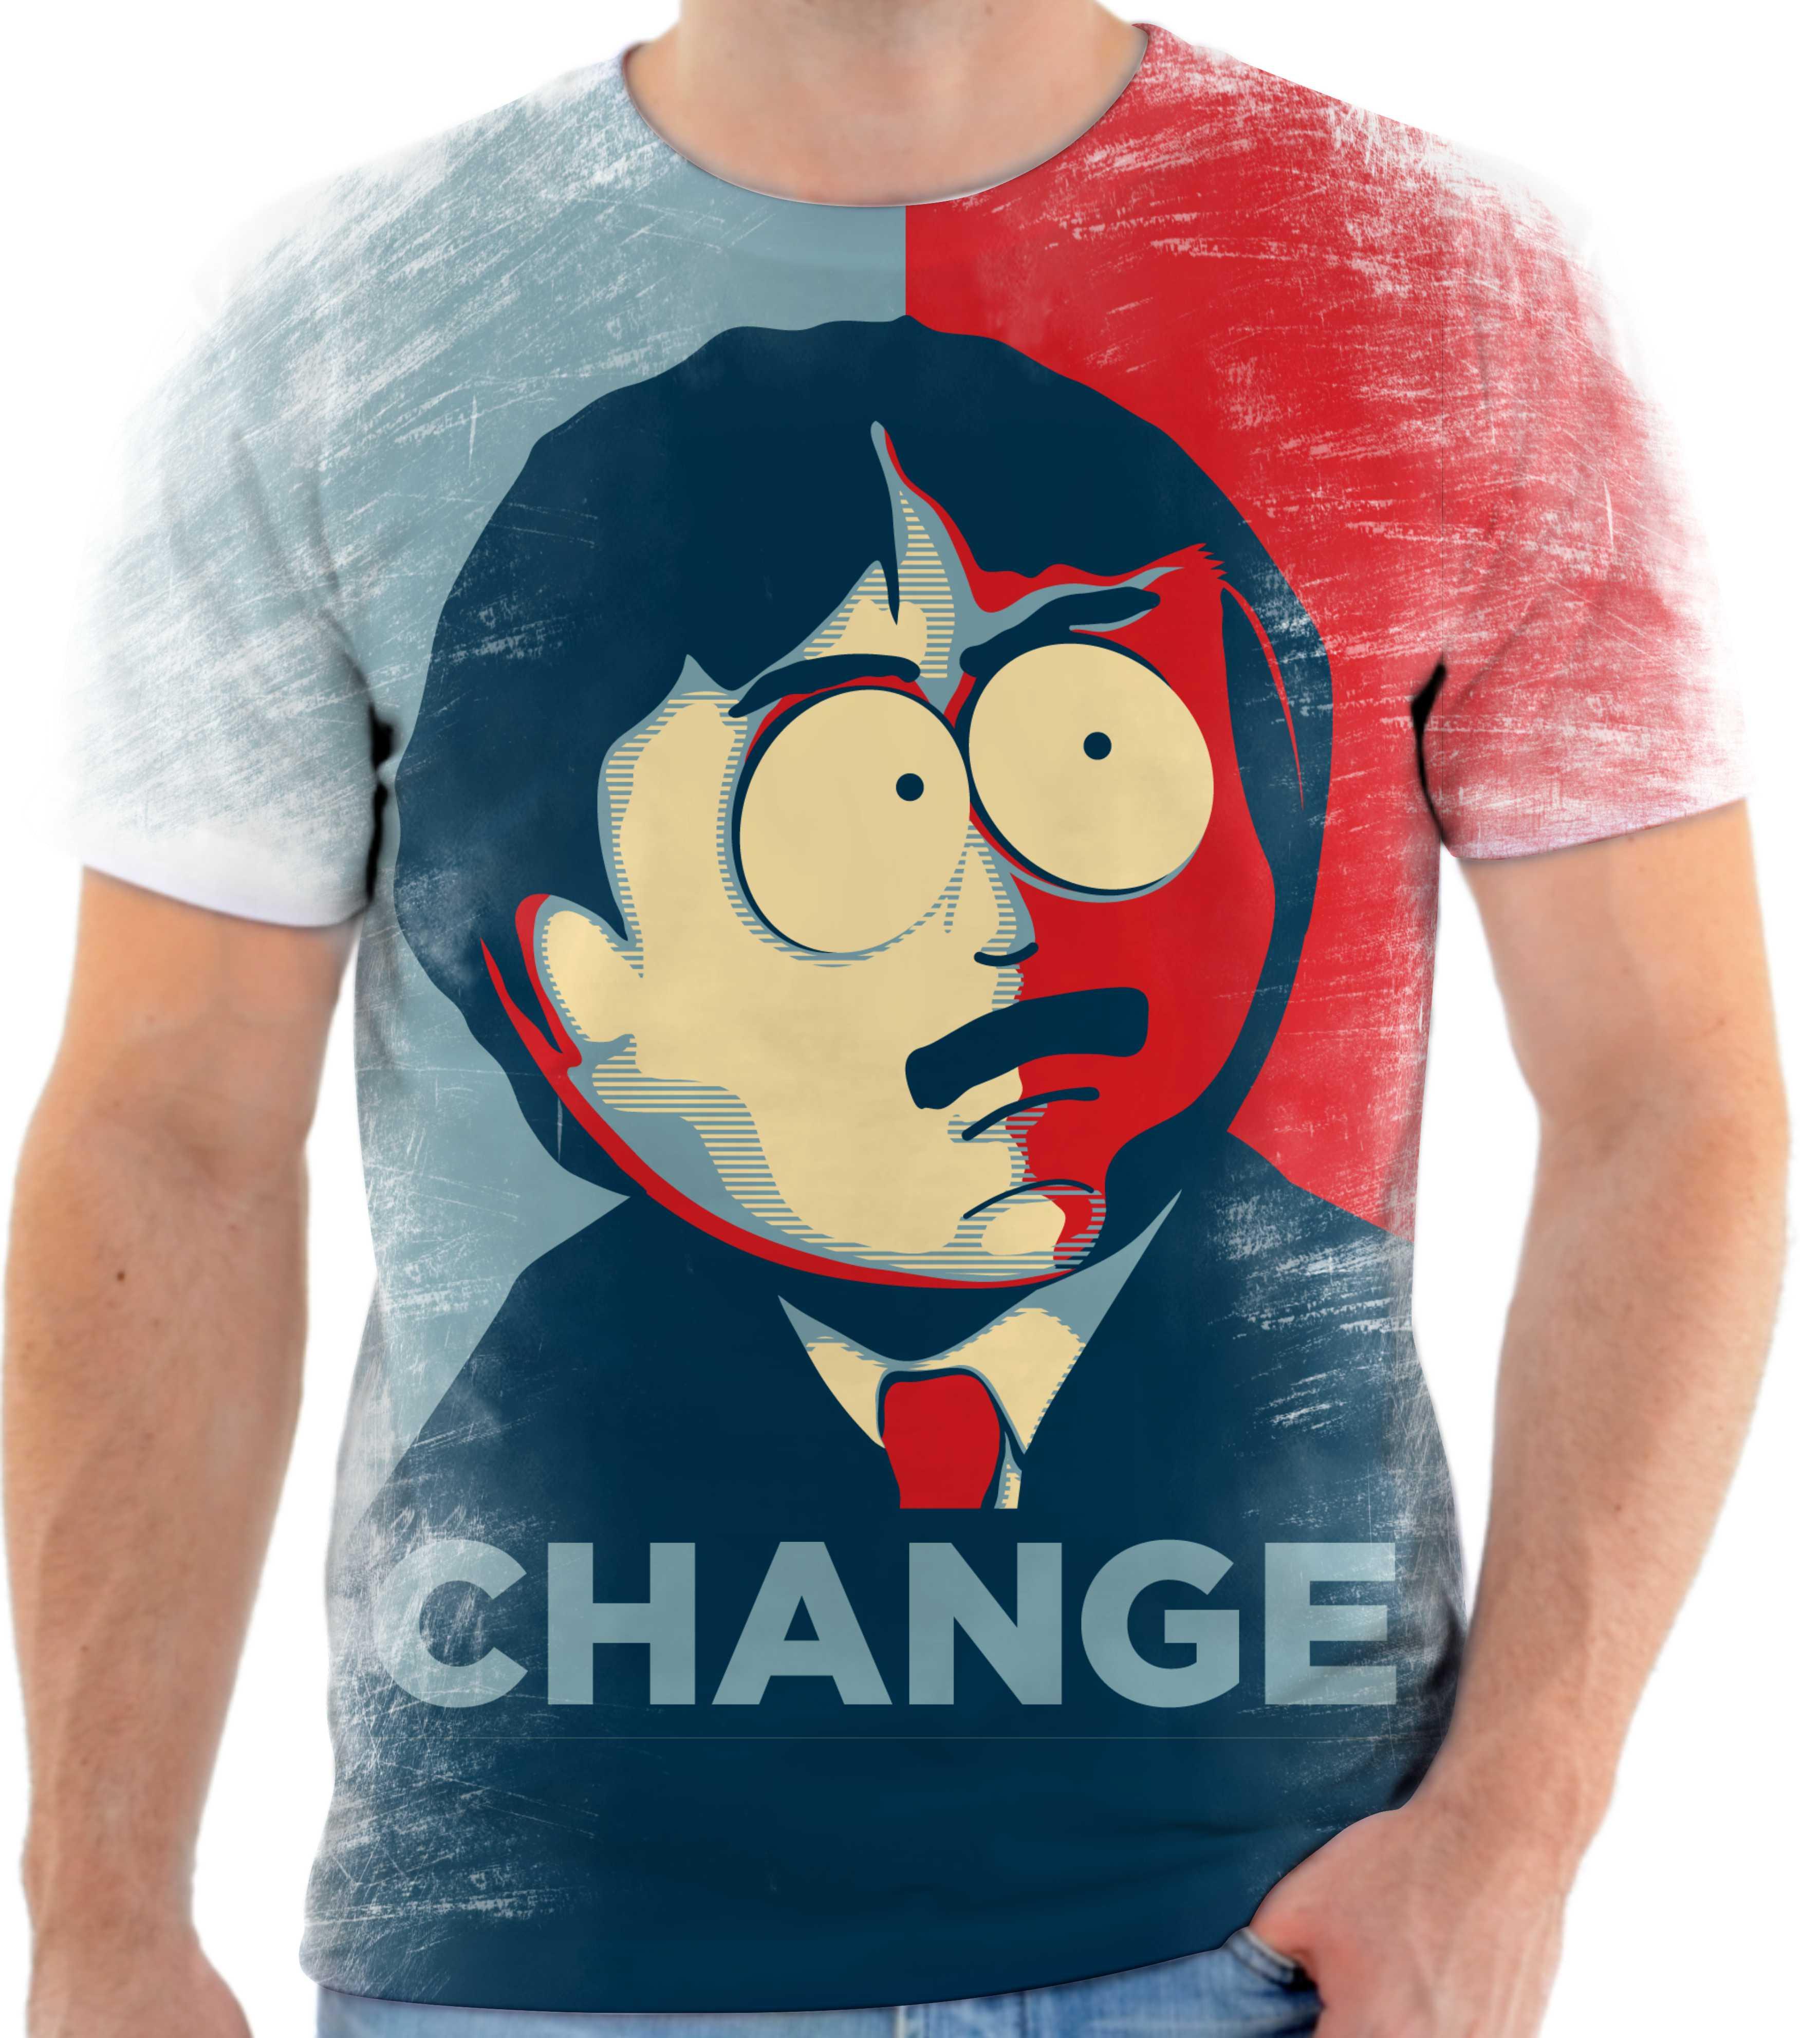 22f9716c96 Camisa Camiseta Blusa Personalizada Filme Desenho Pokemon 1